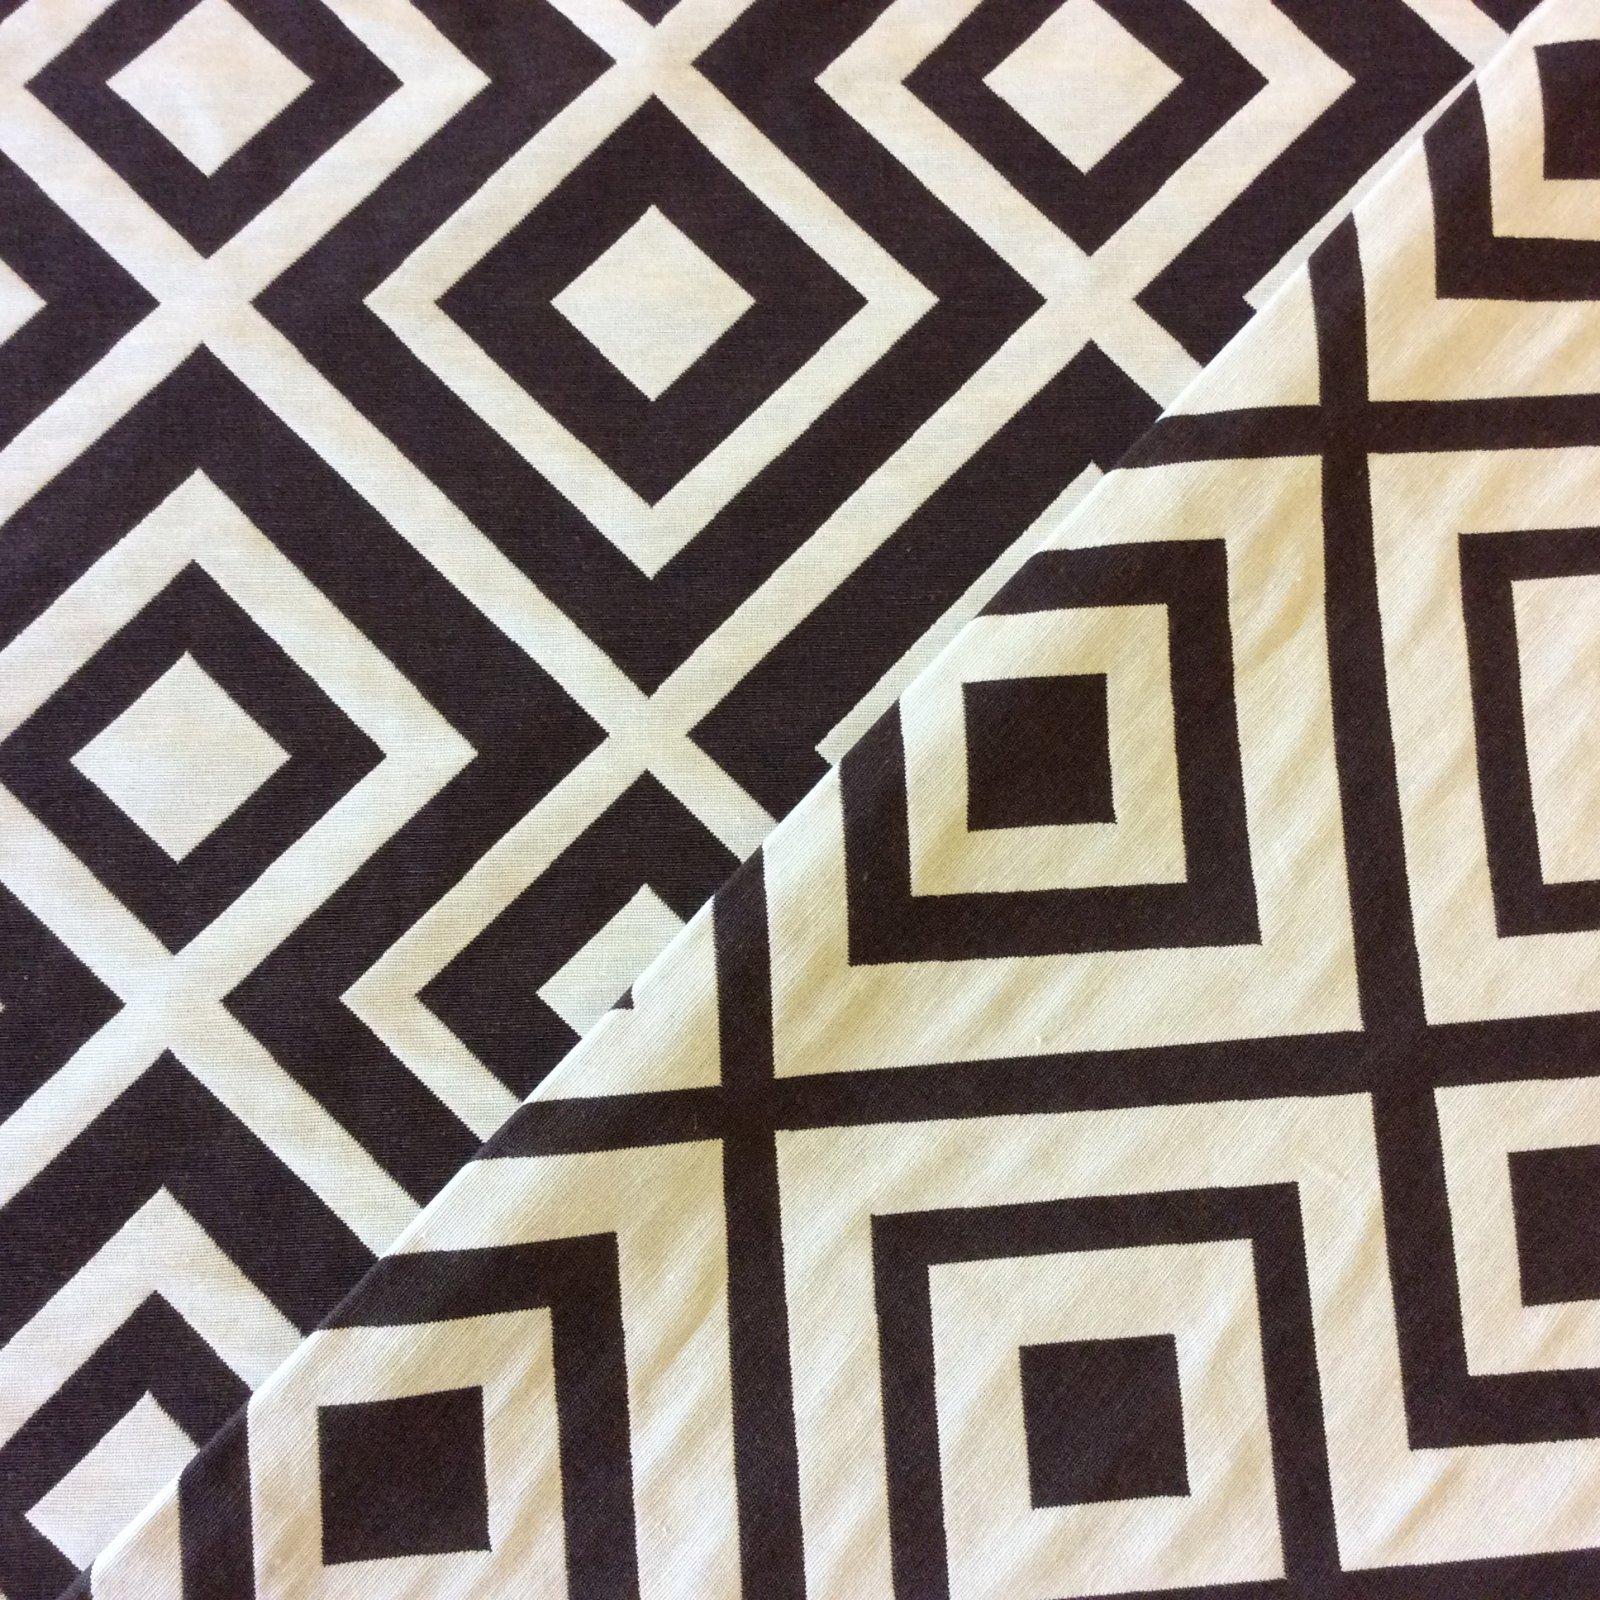 OSEPX100-A Chocolate & White Diamond Geo Geometric Upholstery Home Decor Fabric